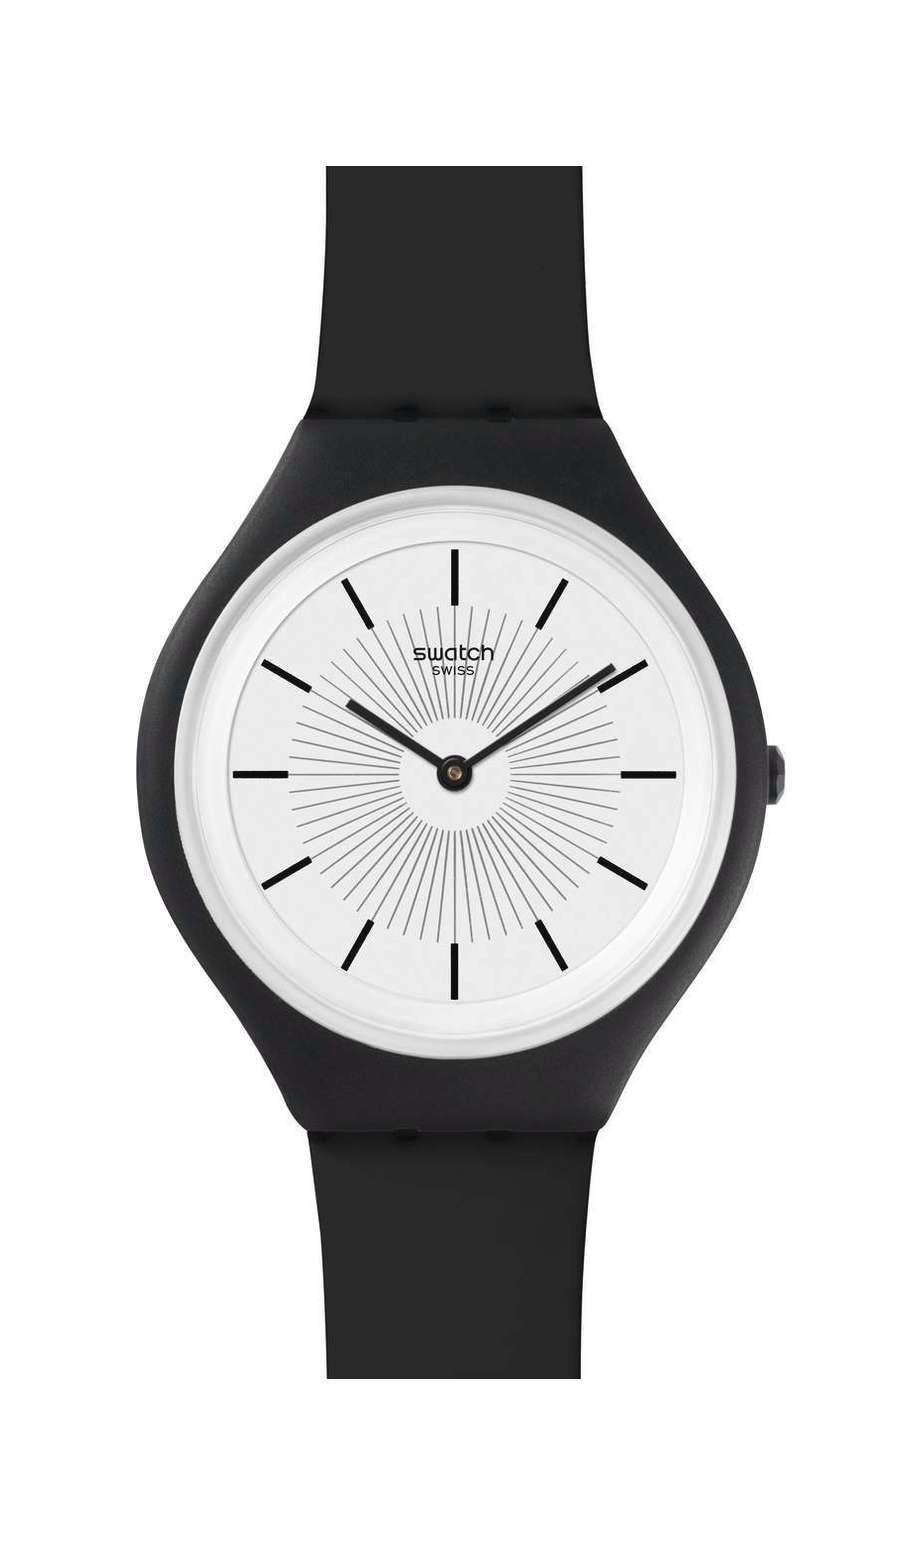 Swatch - SKINNOIR - 1